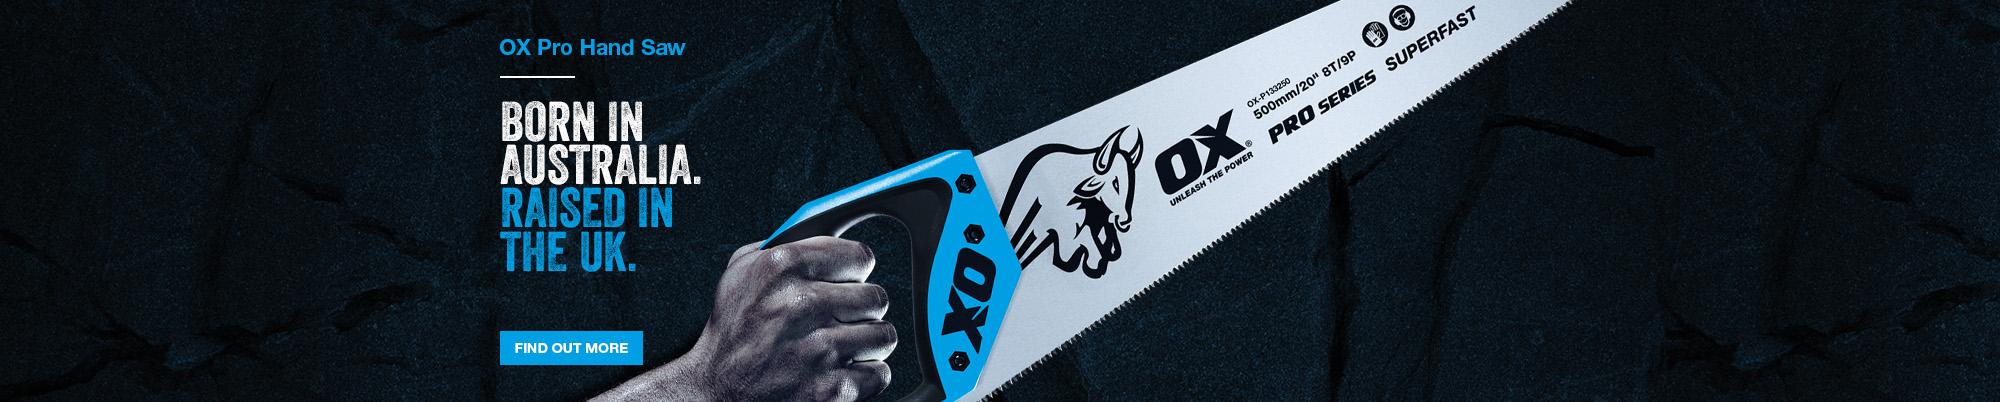 Ox Pro Hand Saw